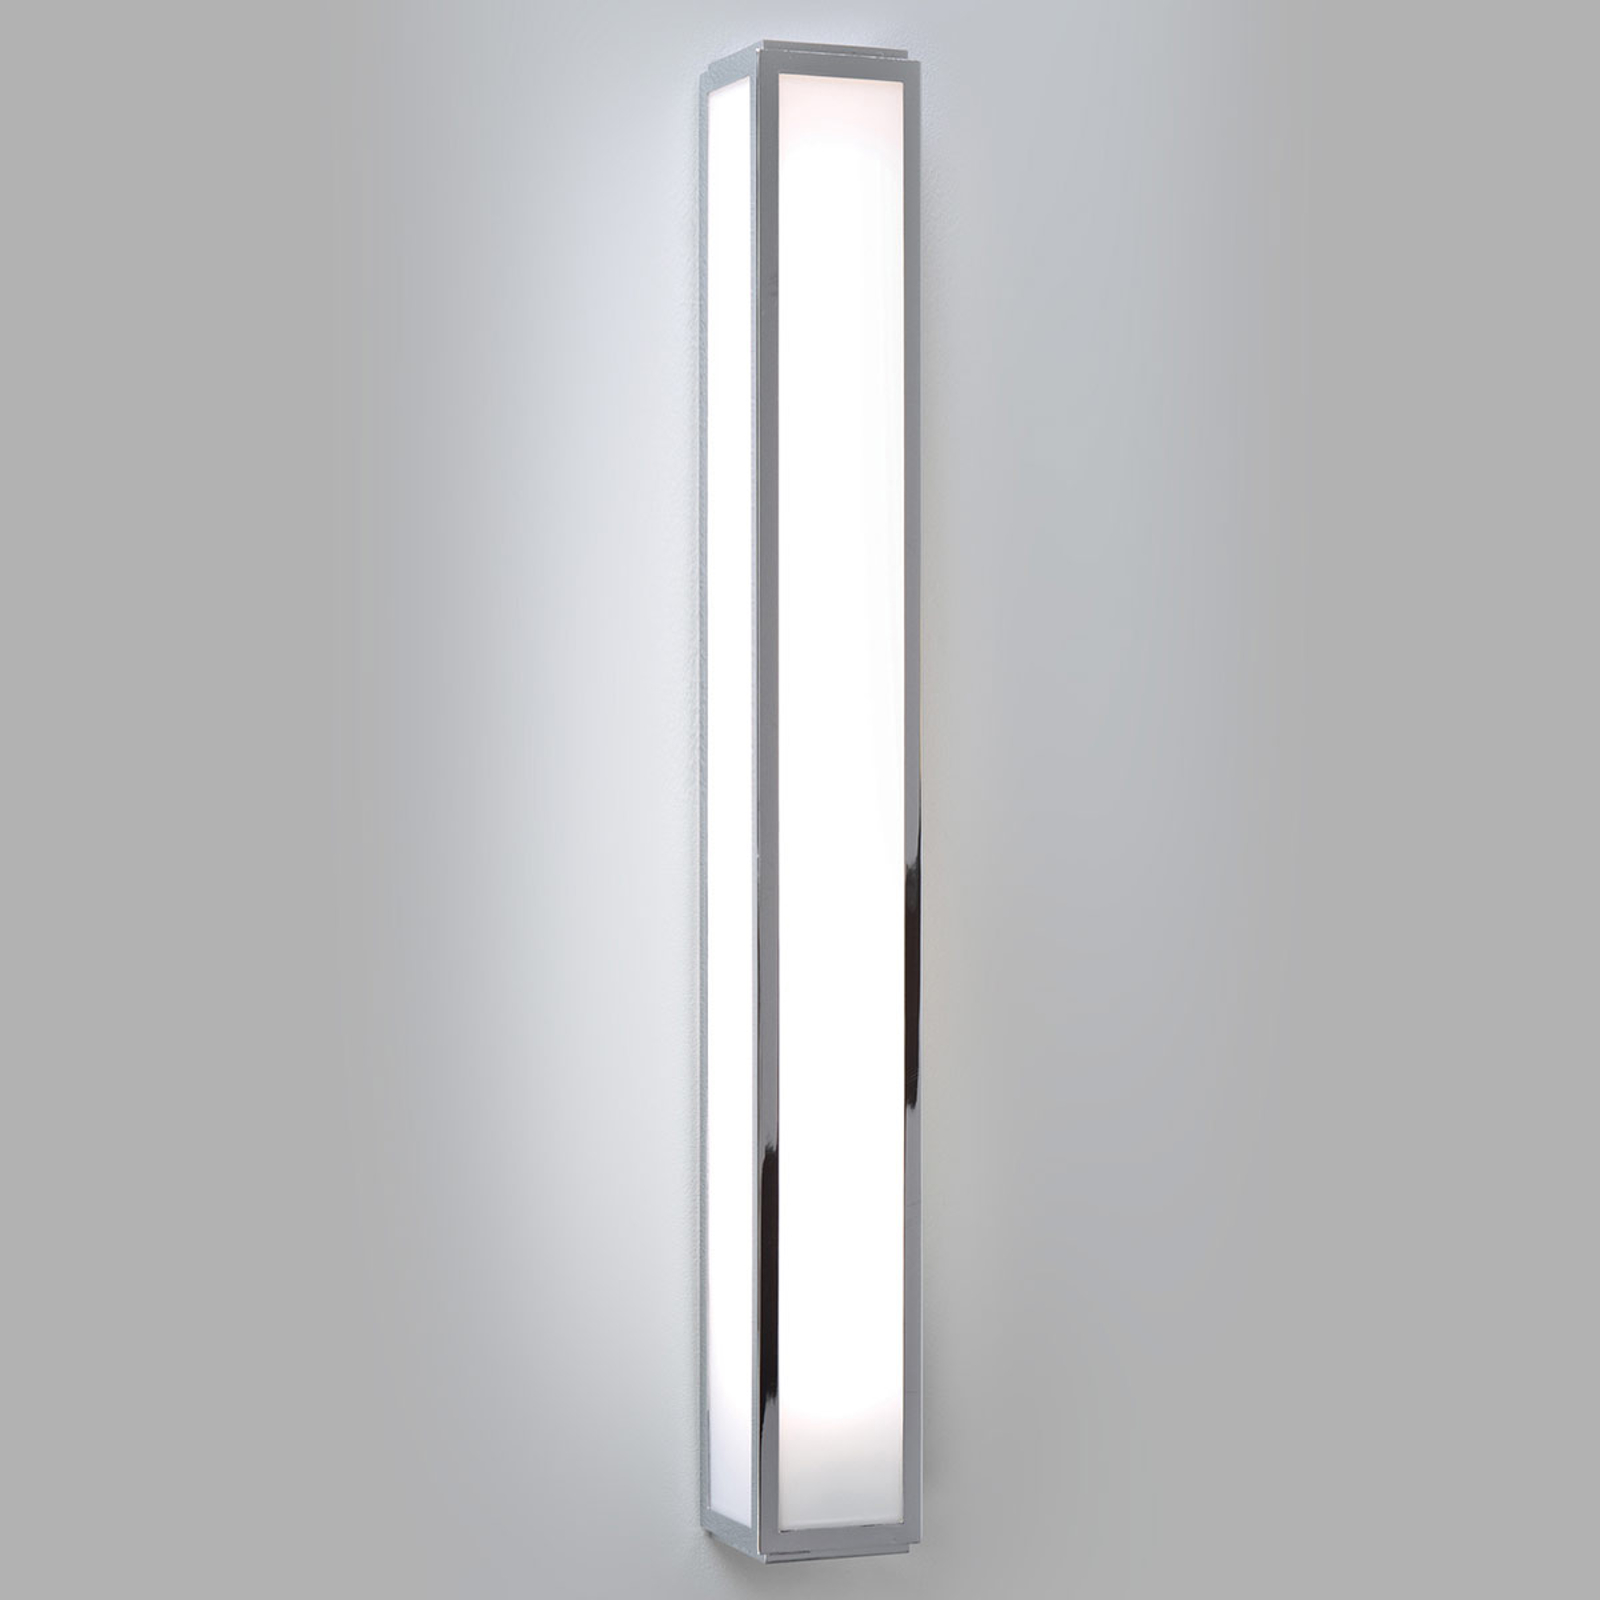 Avlång LED-vägglampa MASHIKO 600 LED